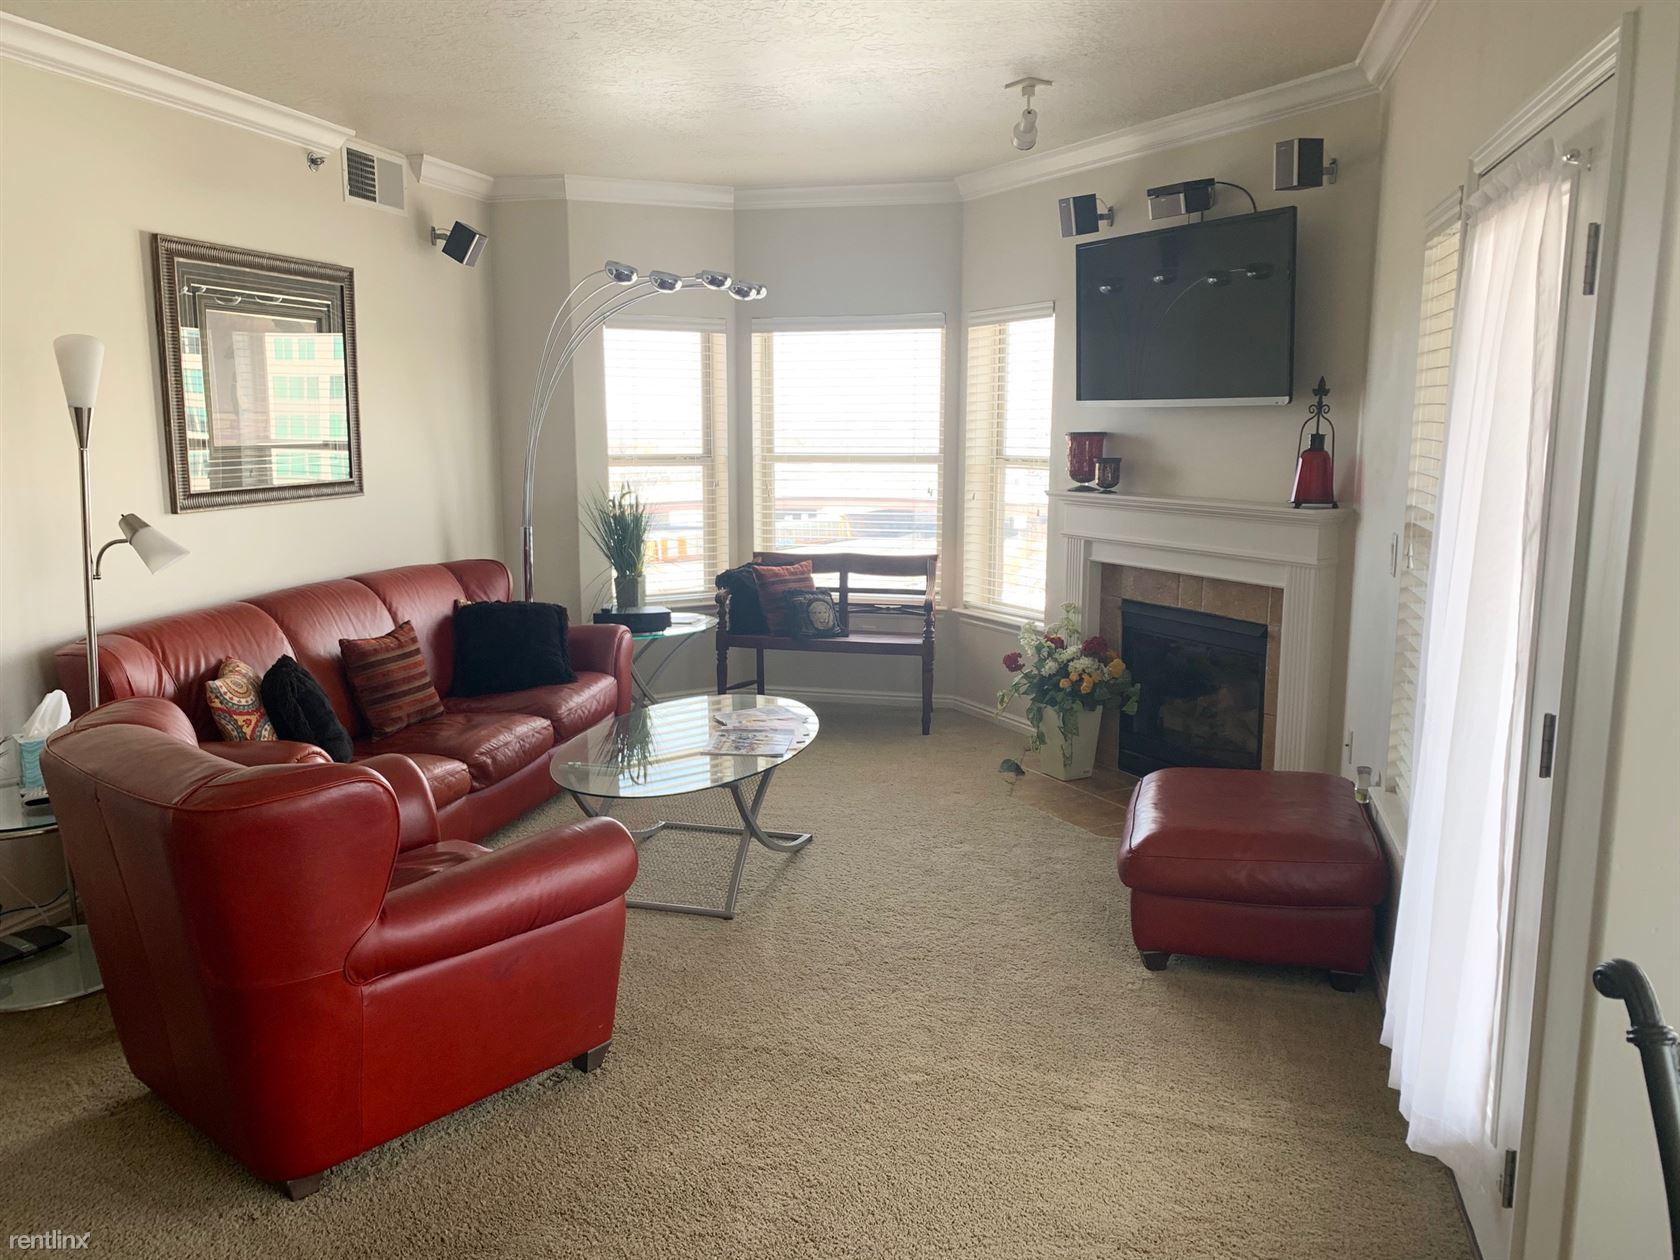 5 S 500 W Unit 1008, Salt Lake City, UT - $3,000